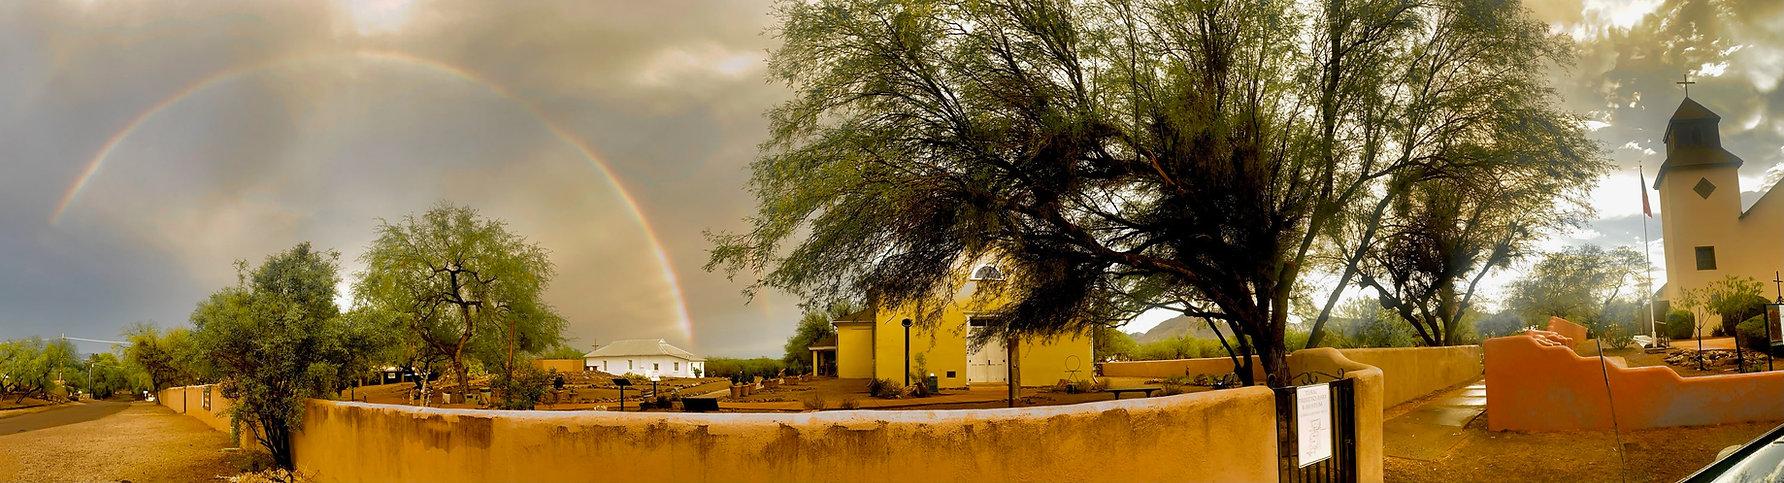 Presidio Rainbow by Amanda Stone.jpeg